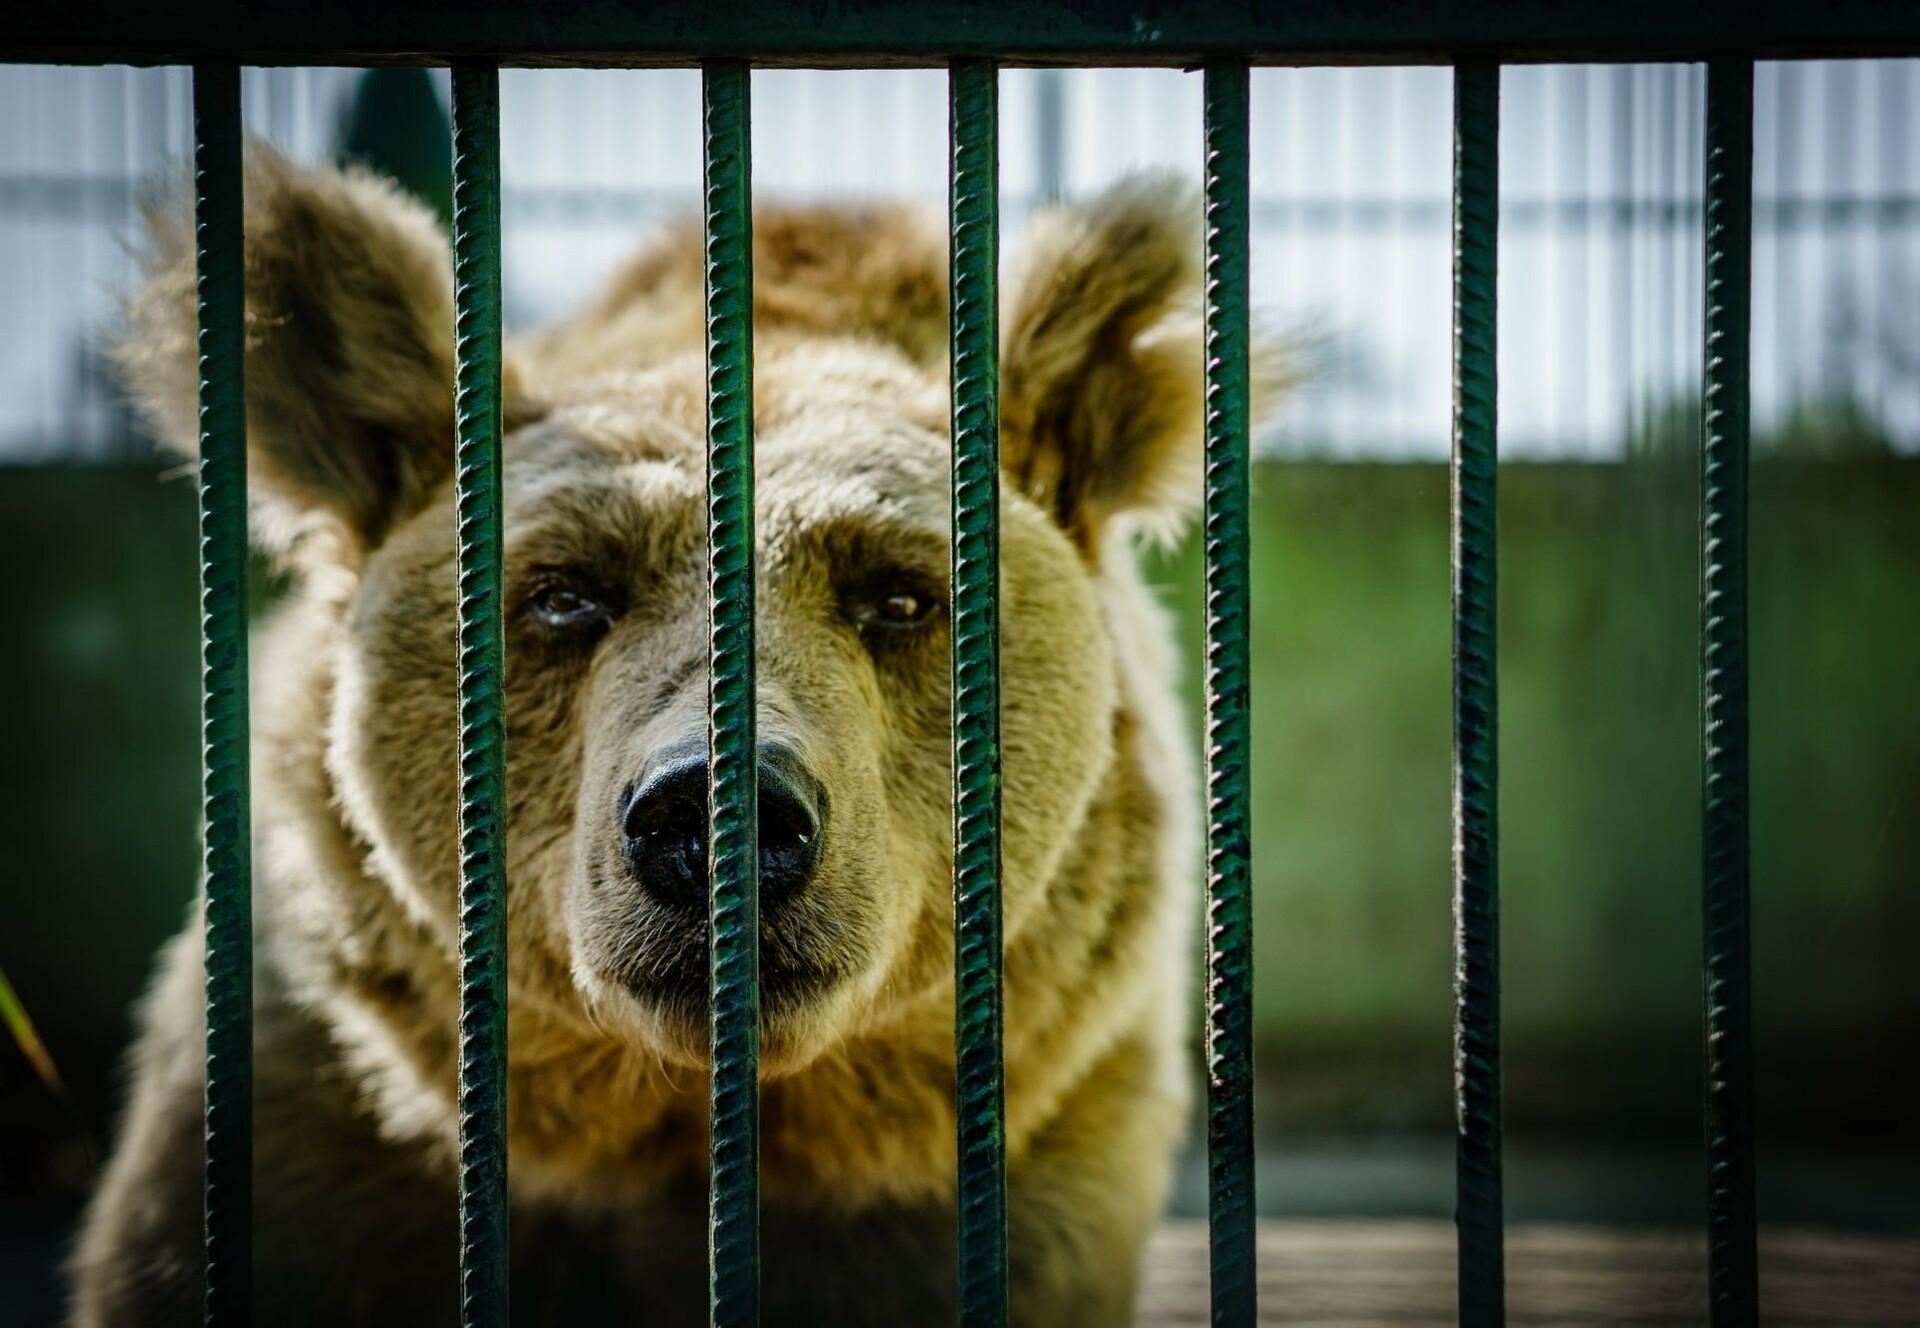 Bear in cage in Croatia